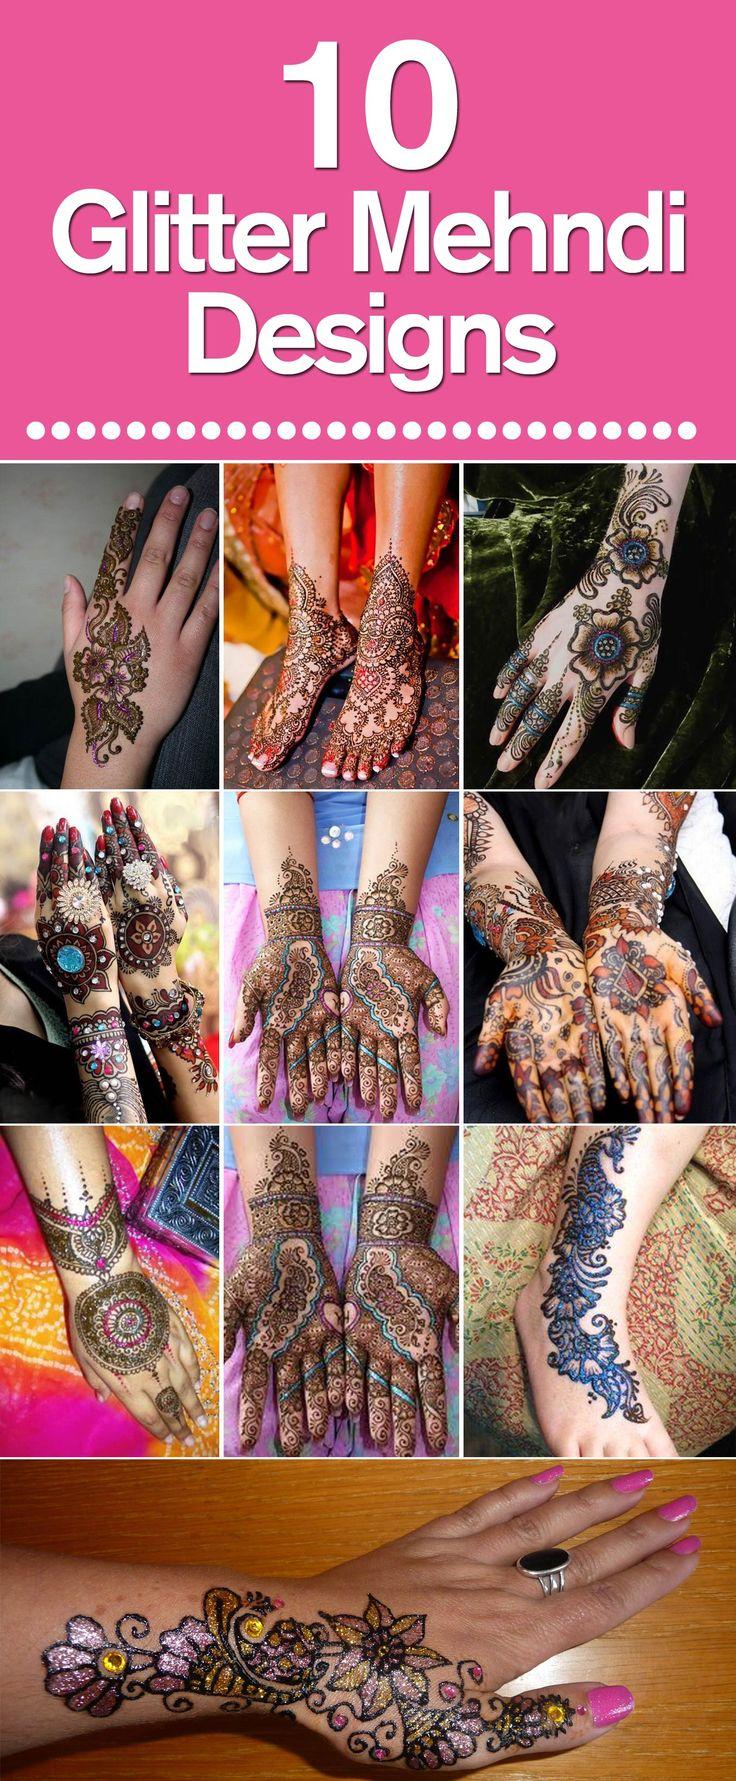 Top 10 beautiful arabic mehndi design art - Best Glitter Mehndi Designs Our Top 10